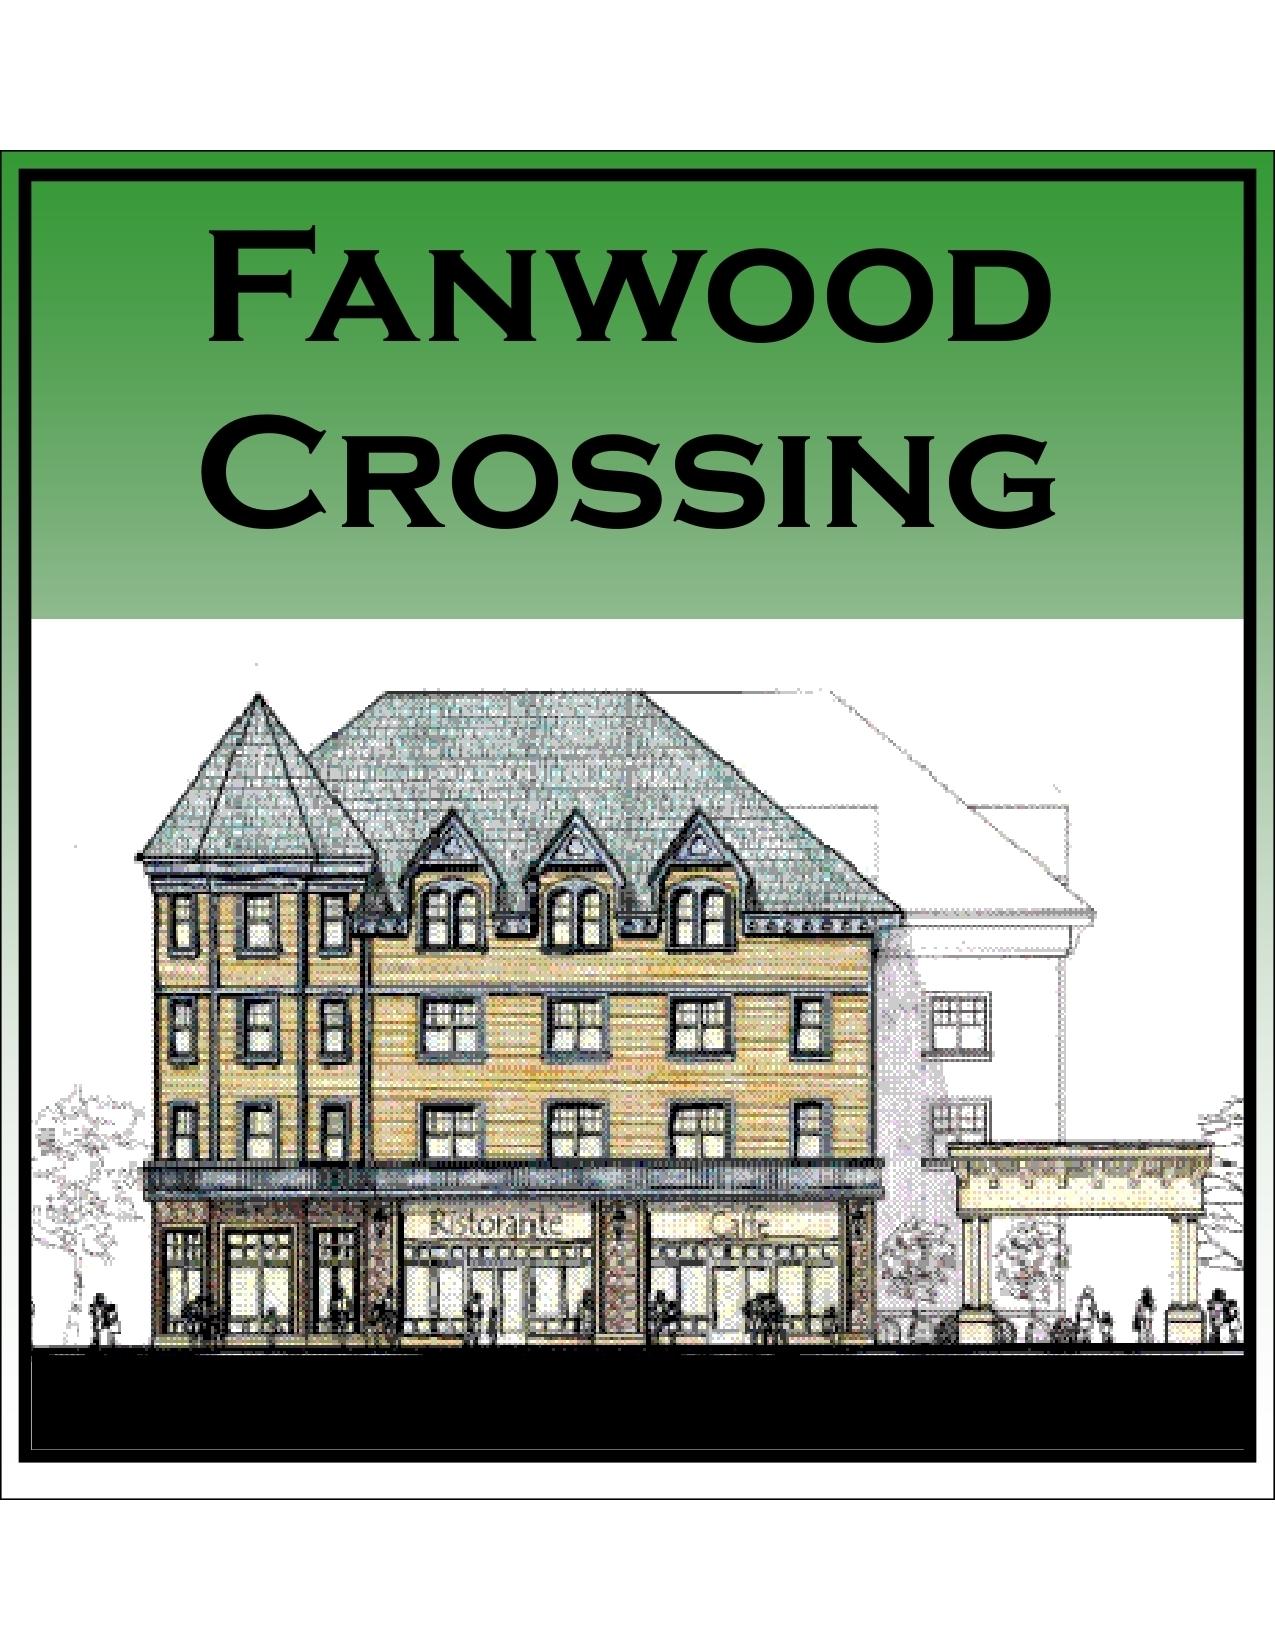 c23a3c0ffcd4290e8292_Fanwood_crossing_drawing.jpg